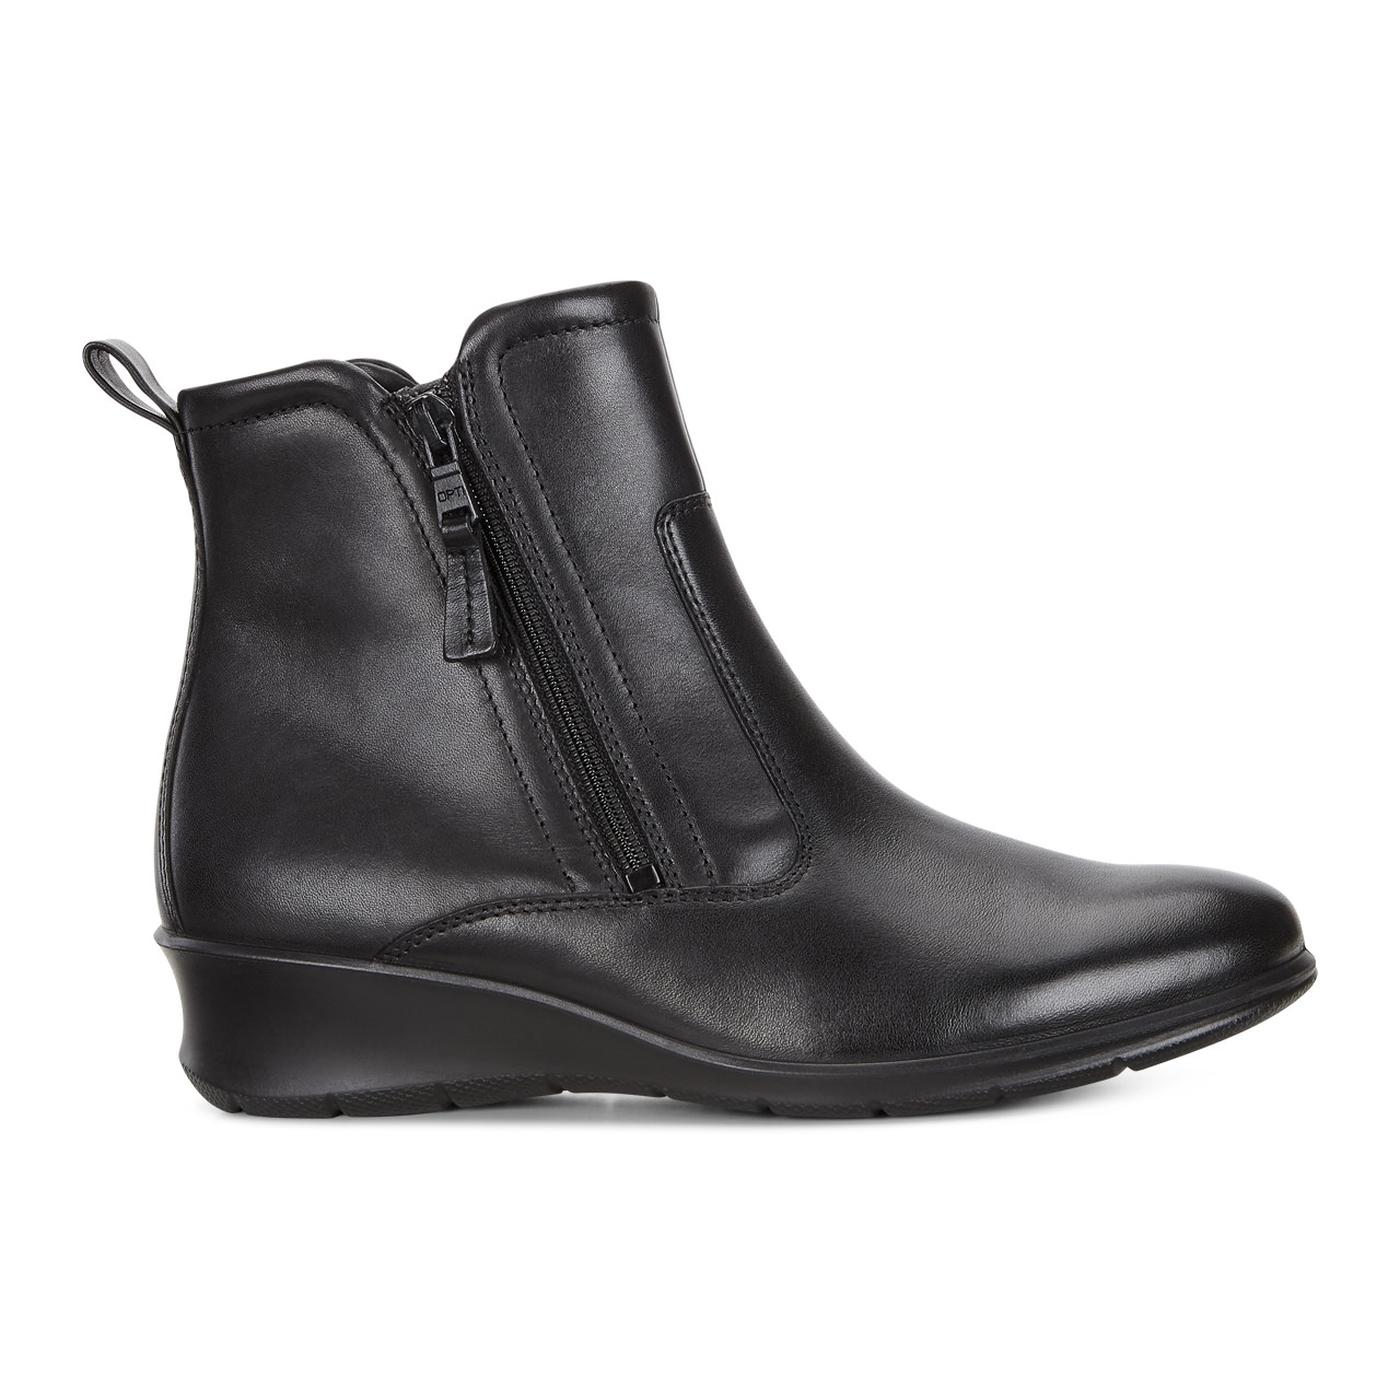 ECCO FELICIA Ankle Boot Zipup